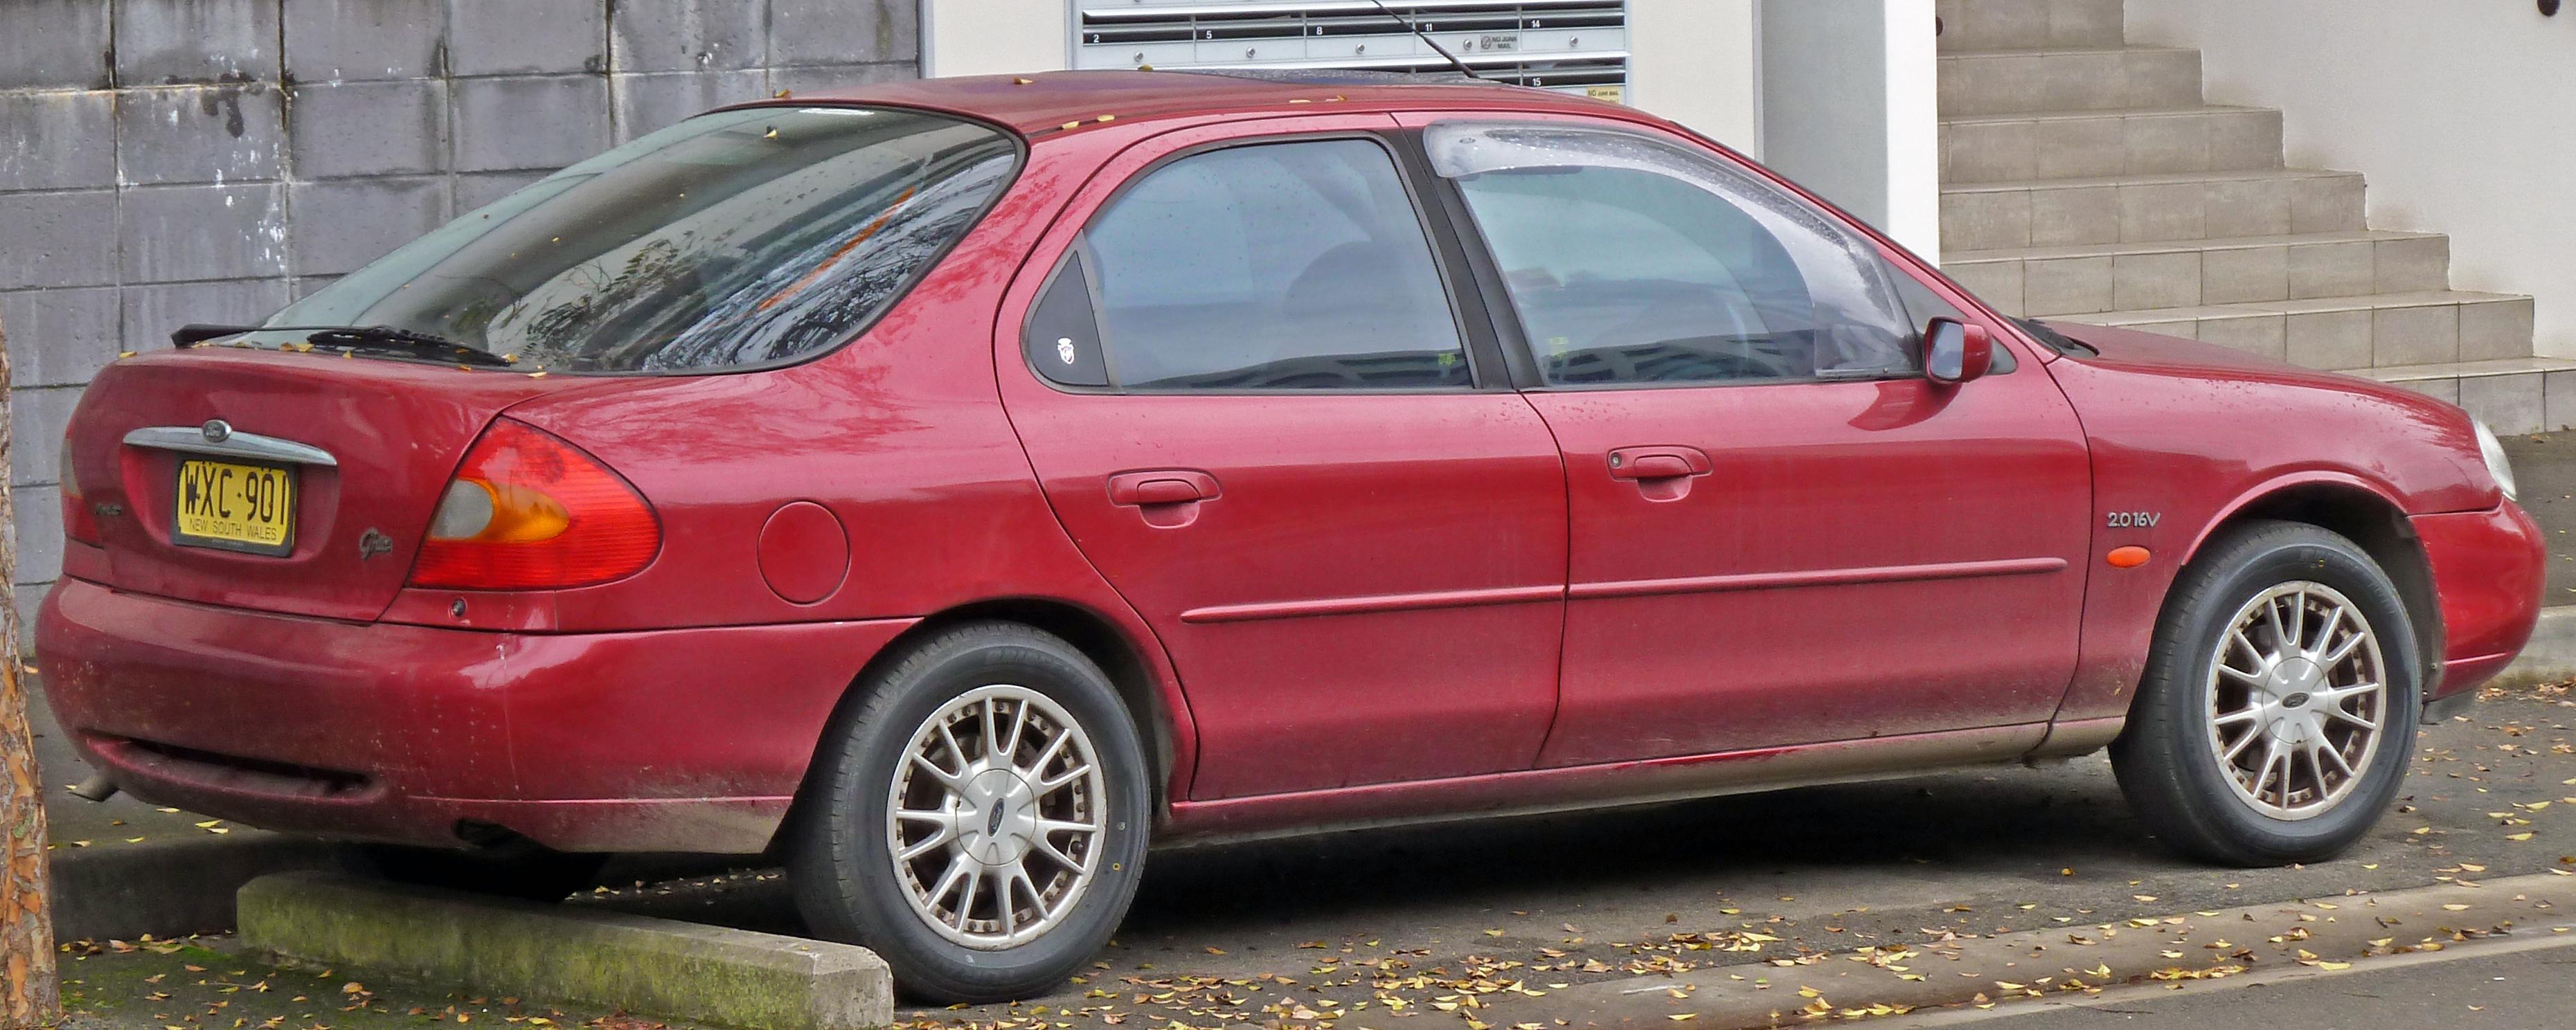 Ford Mondeo I 1993 - 1996 Liftback #1